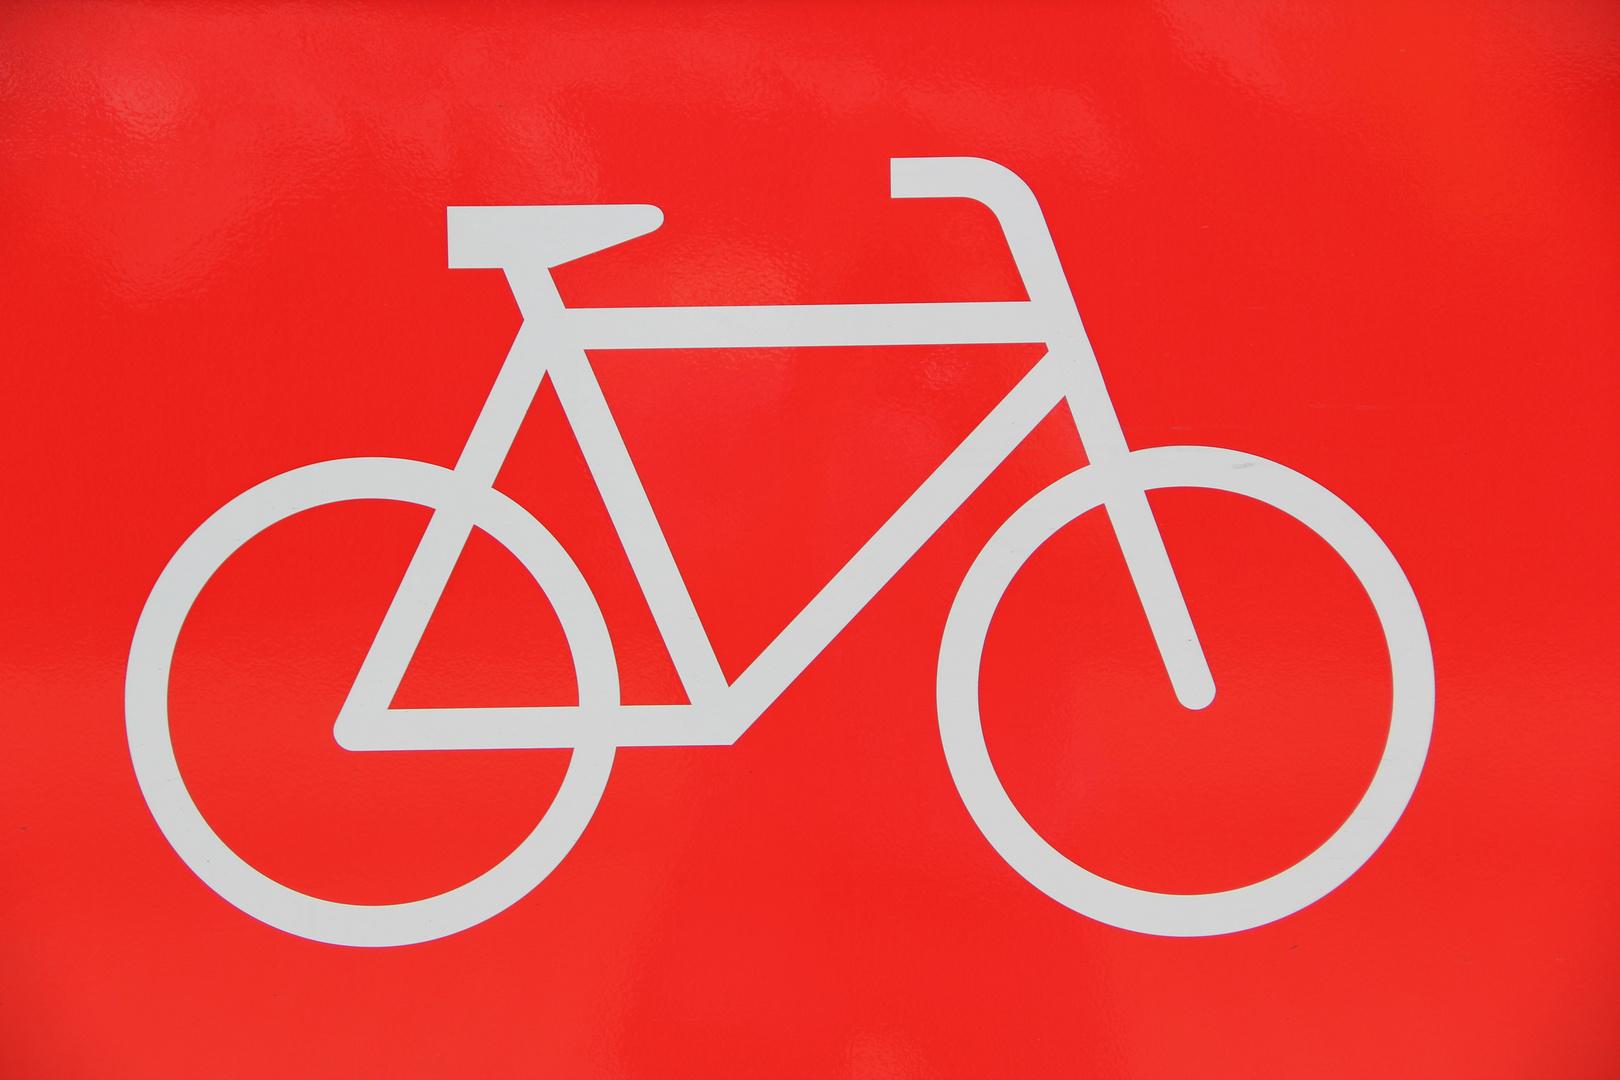 Fahrradzug